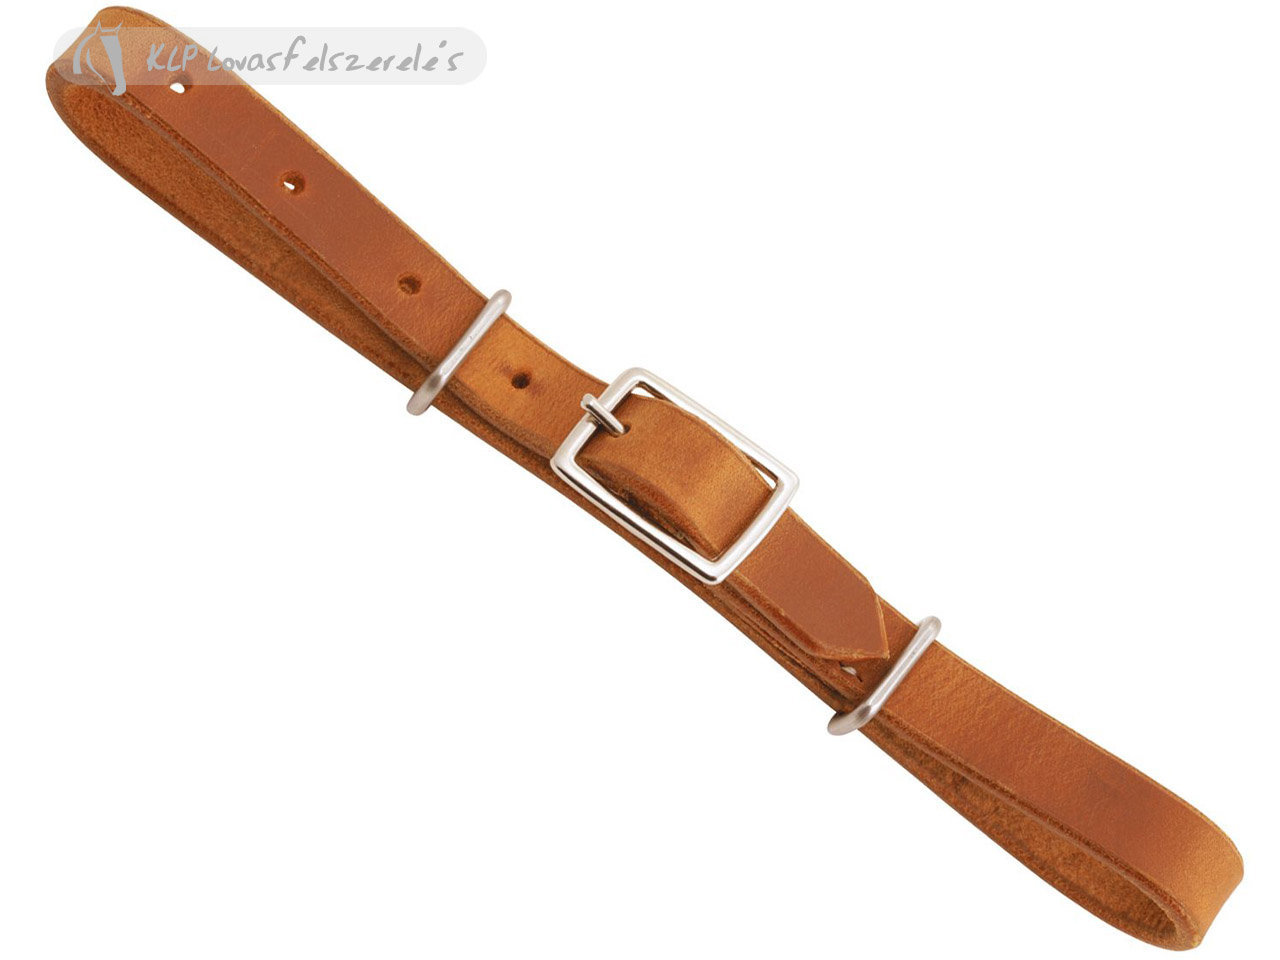 L-Pro Western Leather Chin Strap